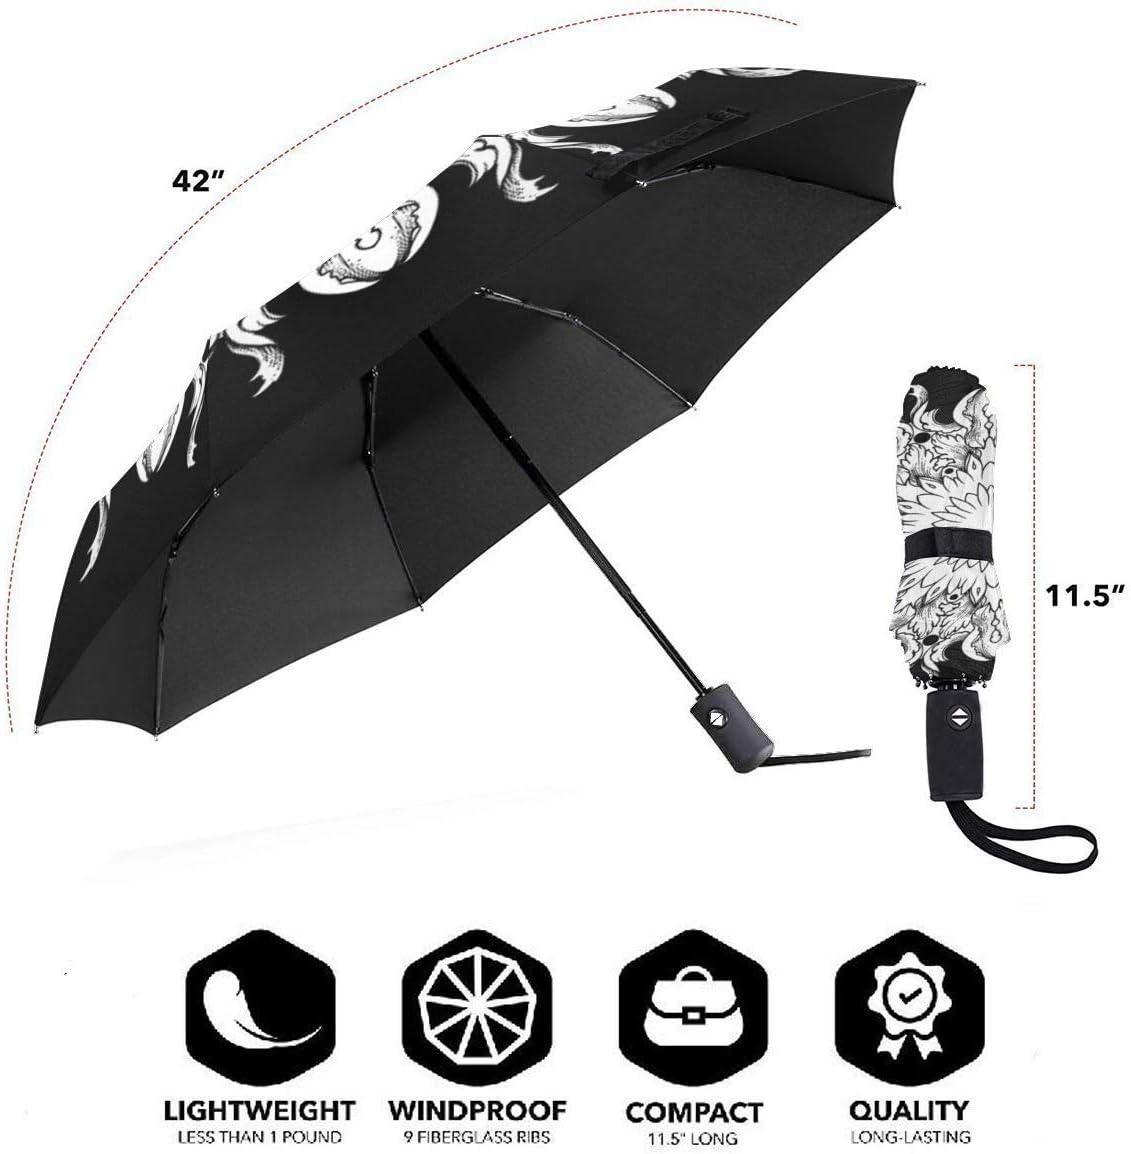 Reinforced Canopy Mandala Pattern Travel Uv Umbrella Lady Men-Automatic Open And Close Rain-Proof Sun-Proof And Wind-Proof Umbrella